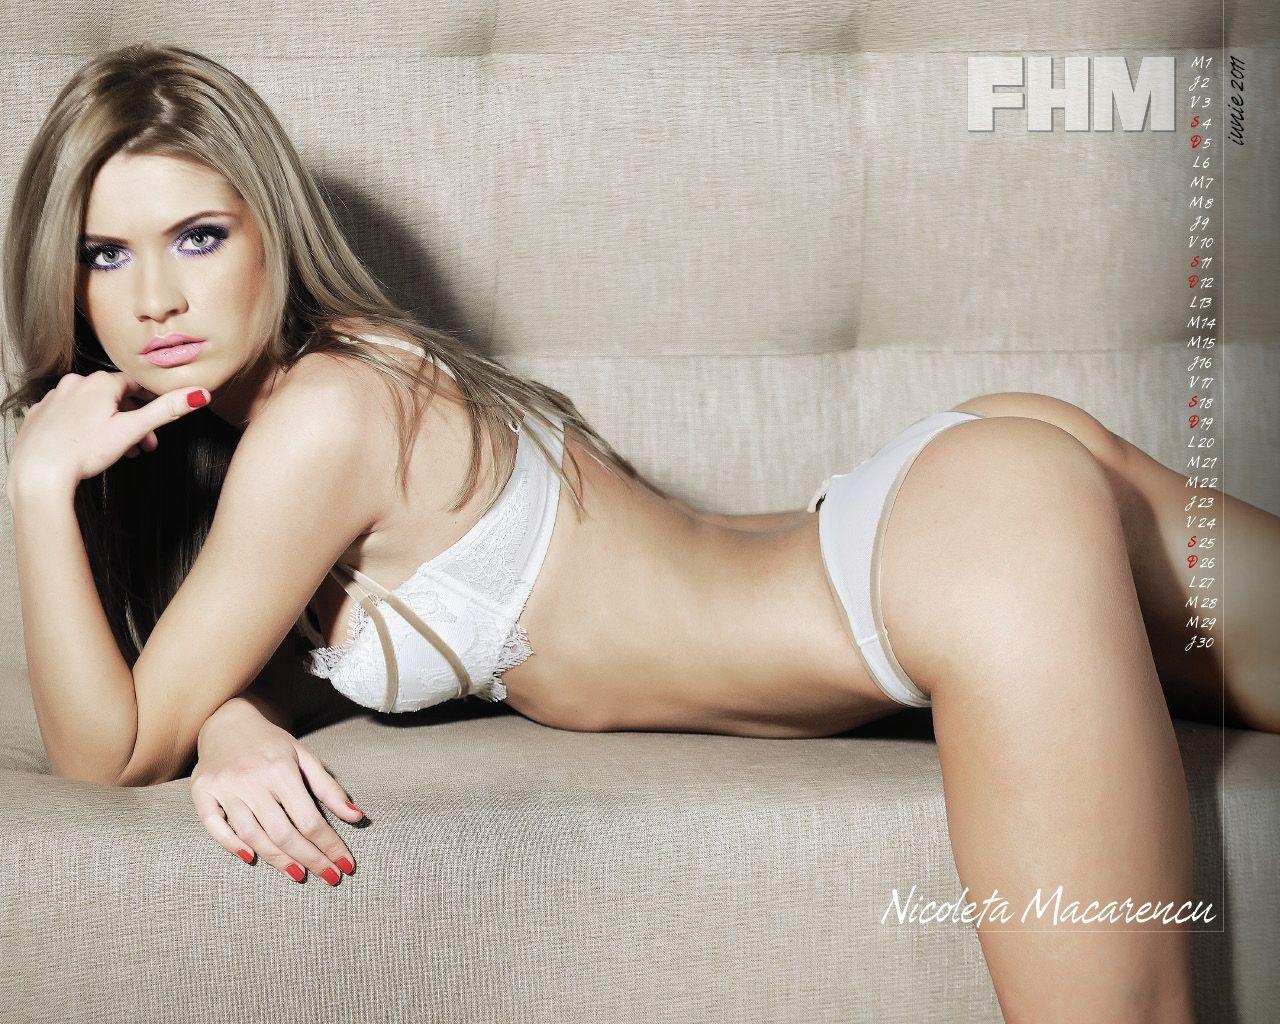 Nicoleta Macarencu Nude Photos 42